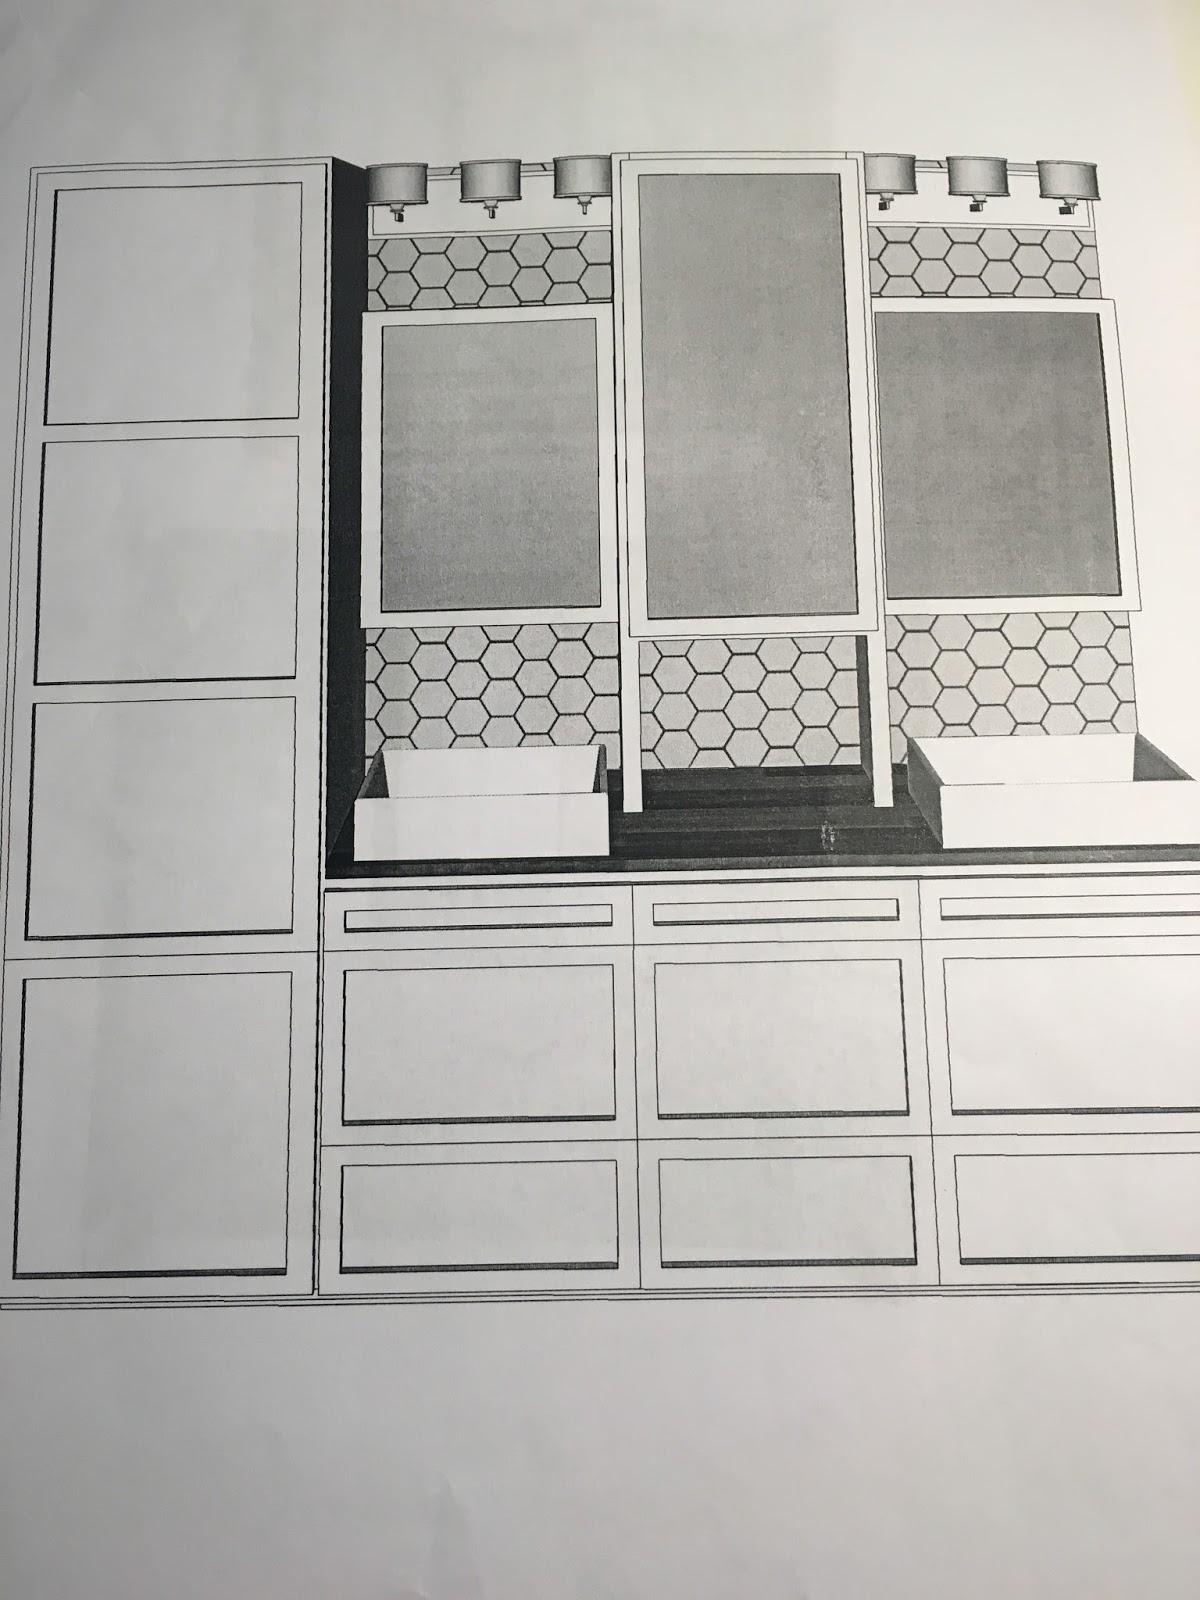 Ideal Drafting Sketch Up Plan